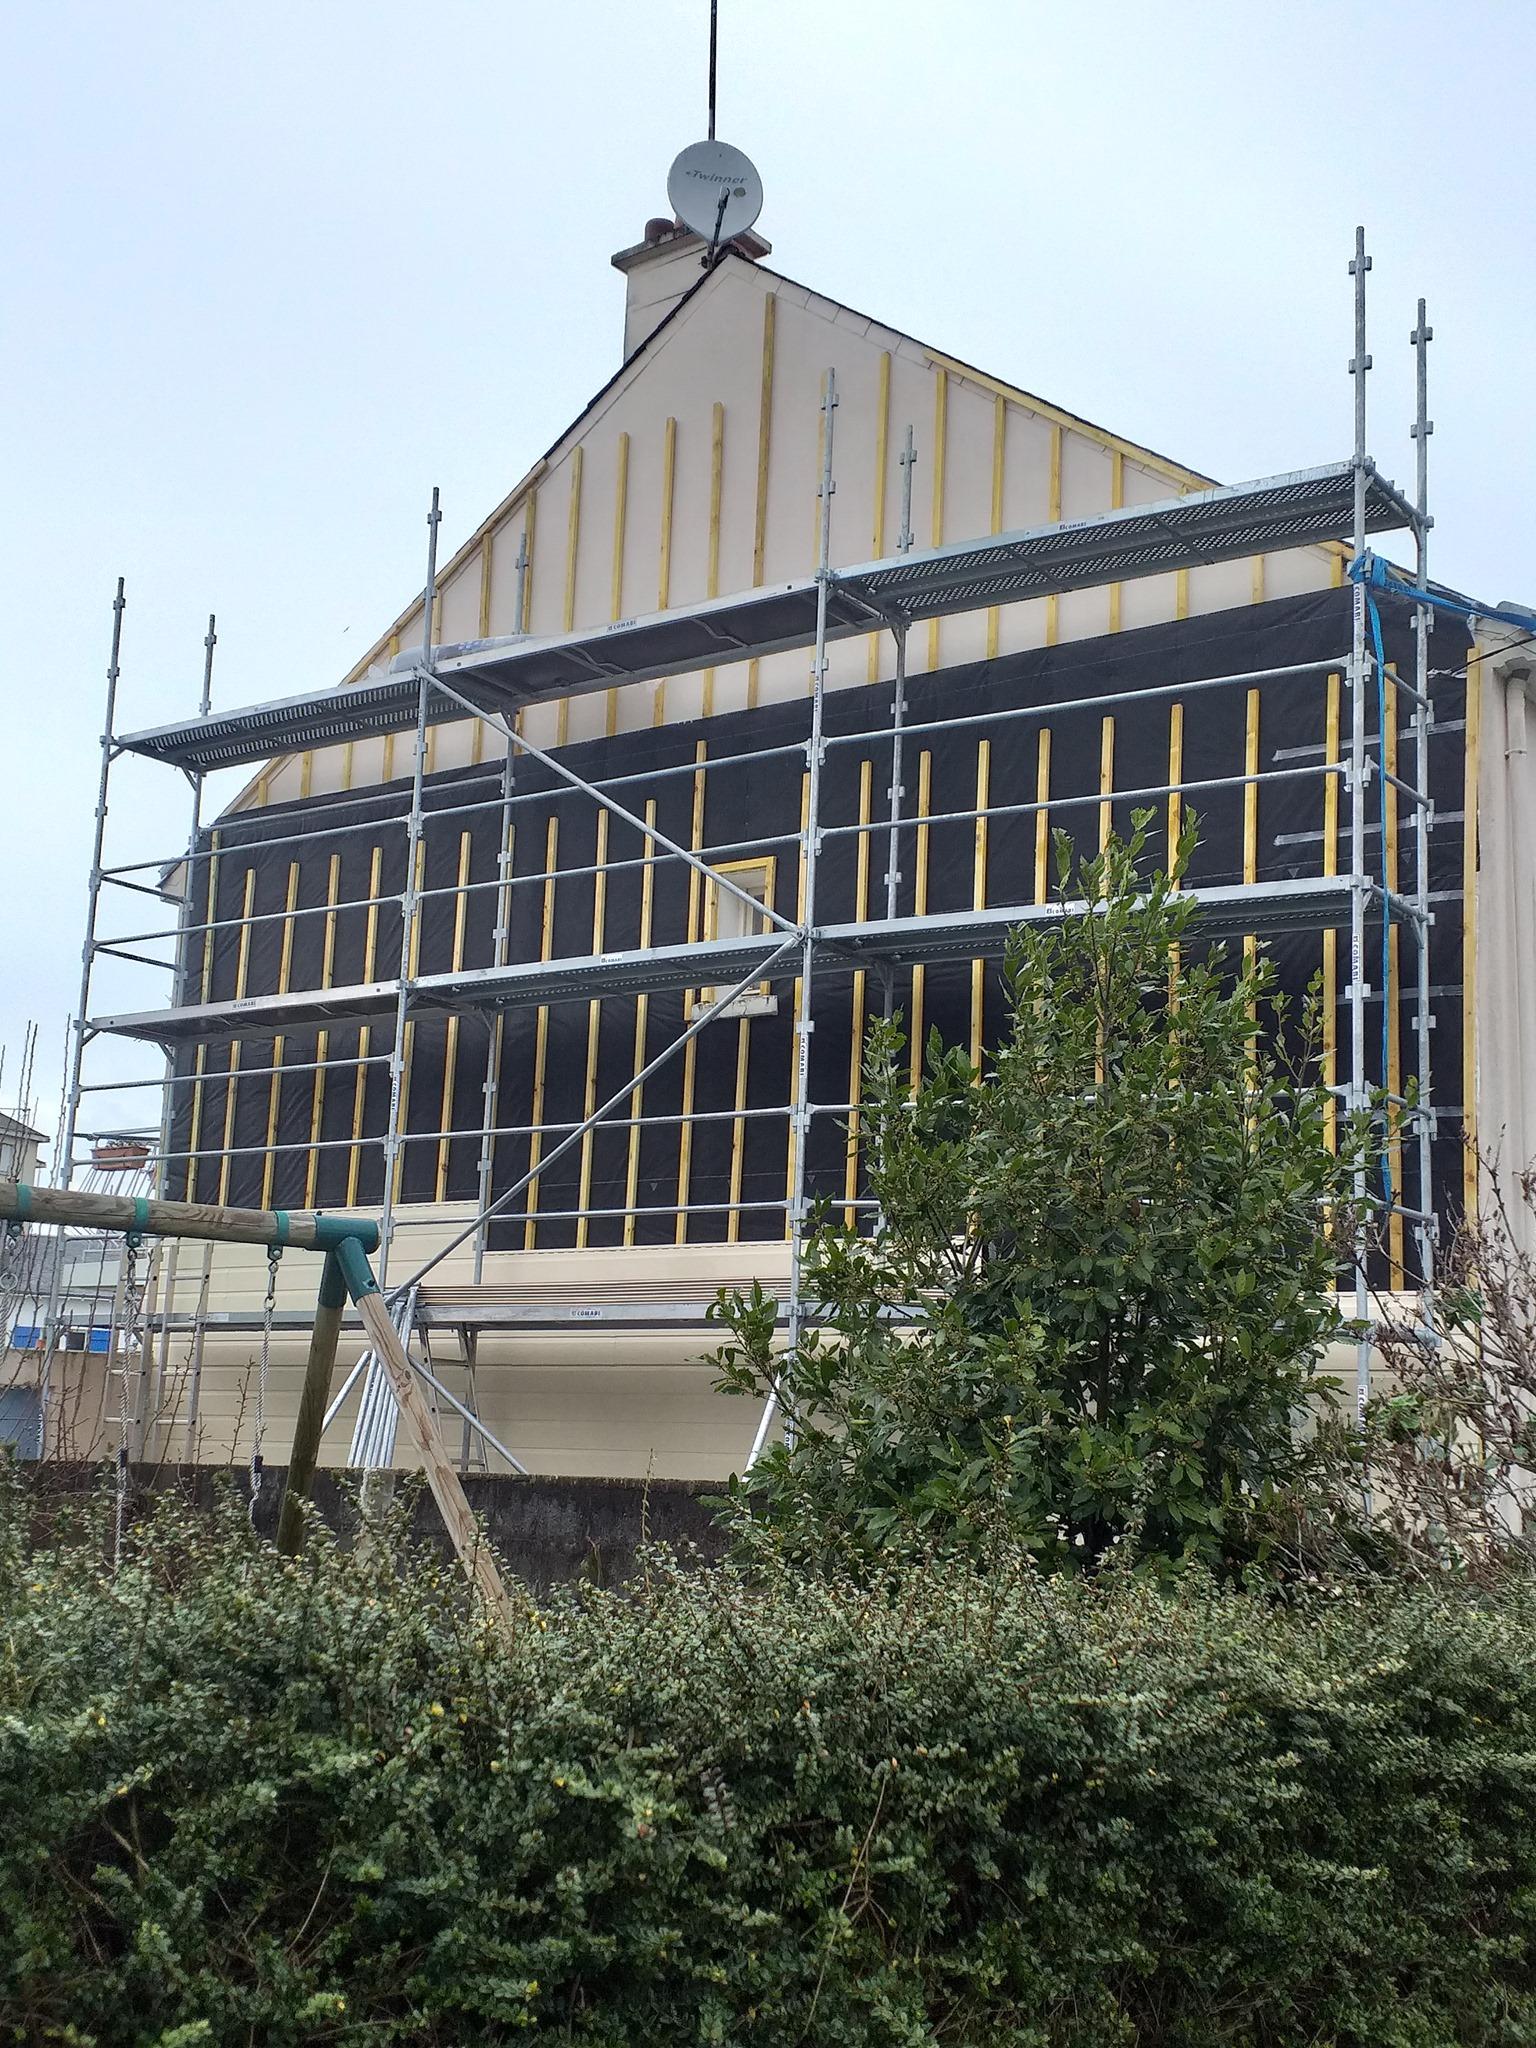 01_2 Rénovation-de-facade-pose-de-bardage